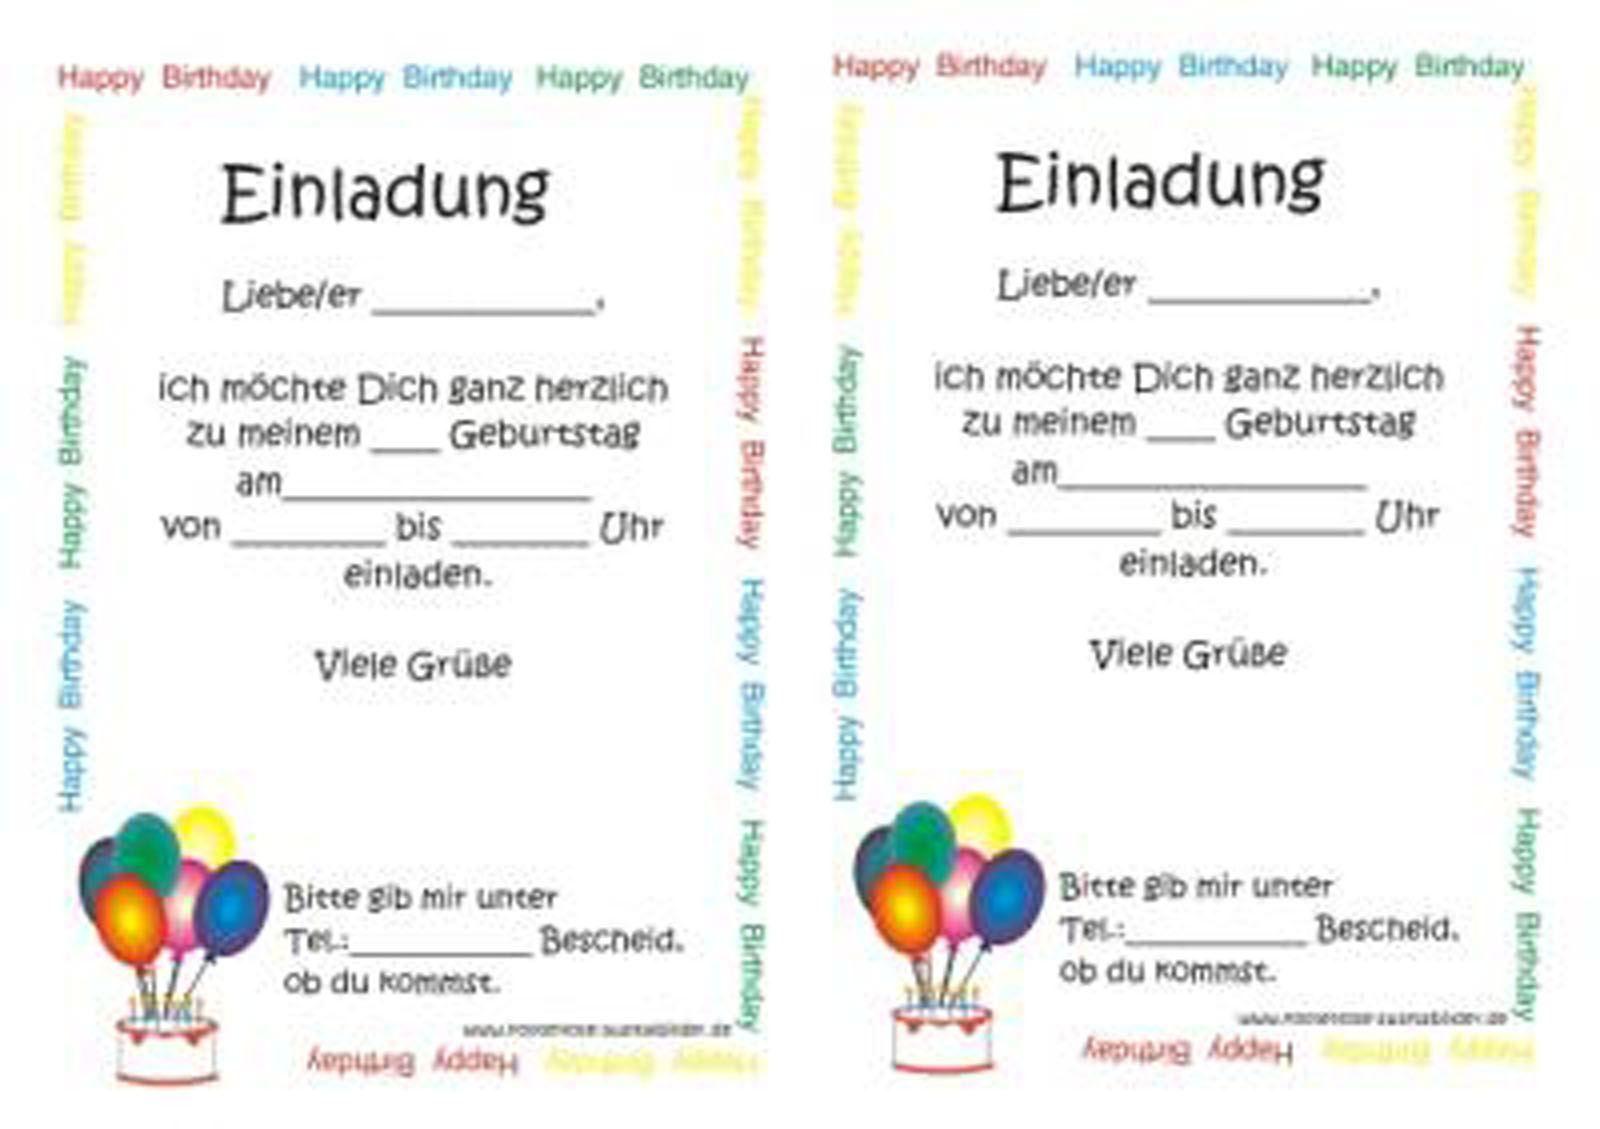 wonderful Einladungskarte Kindergeburtstag Vorlage #2: Einladungskarten Kindergeburtstag : Einladungskarten Kindergeburtstag  Selber Basteln Vorlagen - Kindergeburtstag Einladung - Kindergeburtstag  Einladung